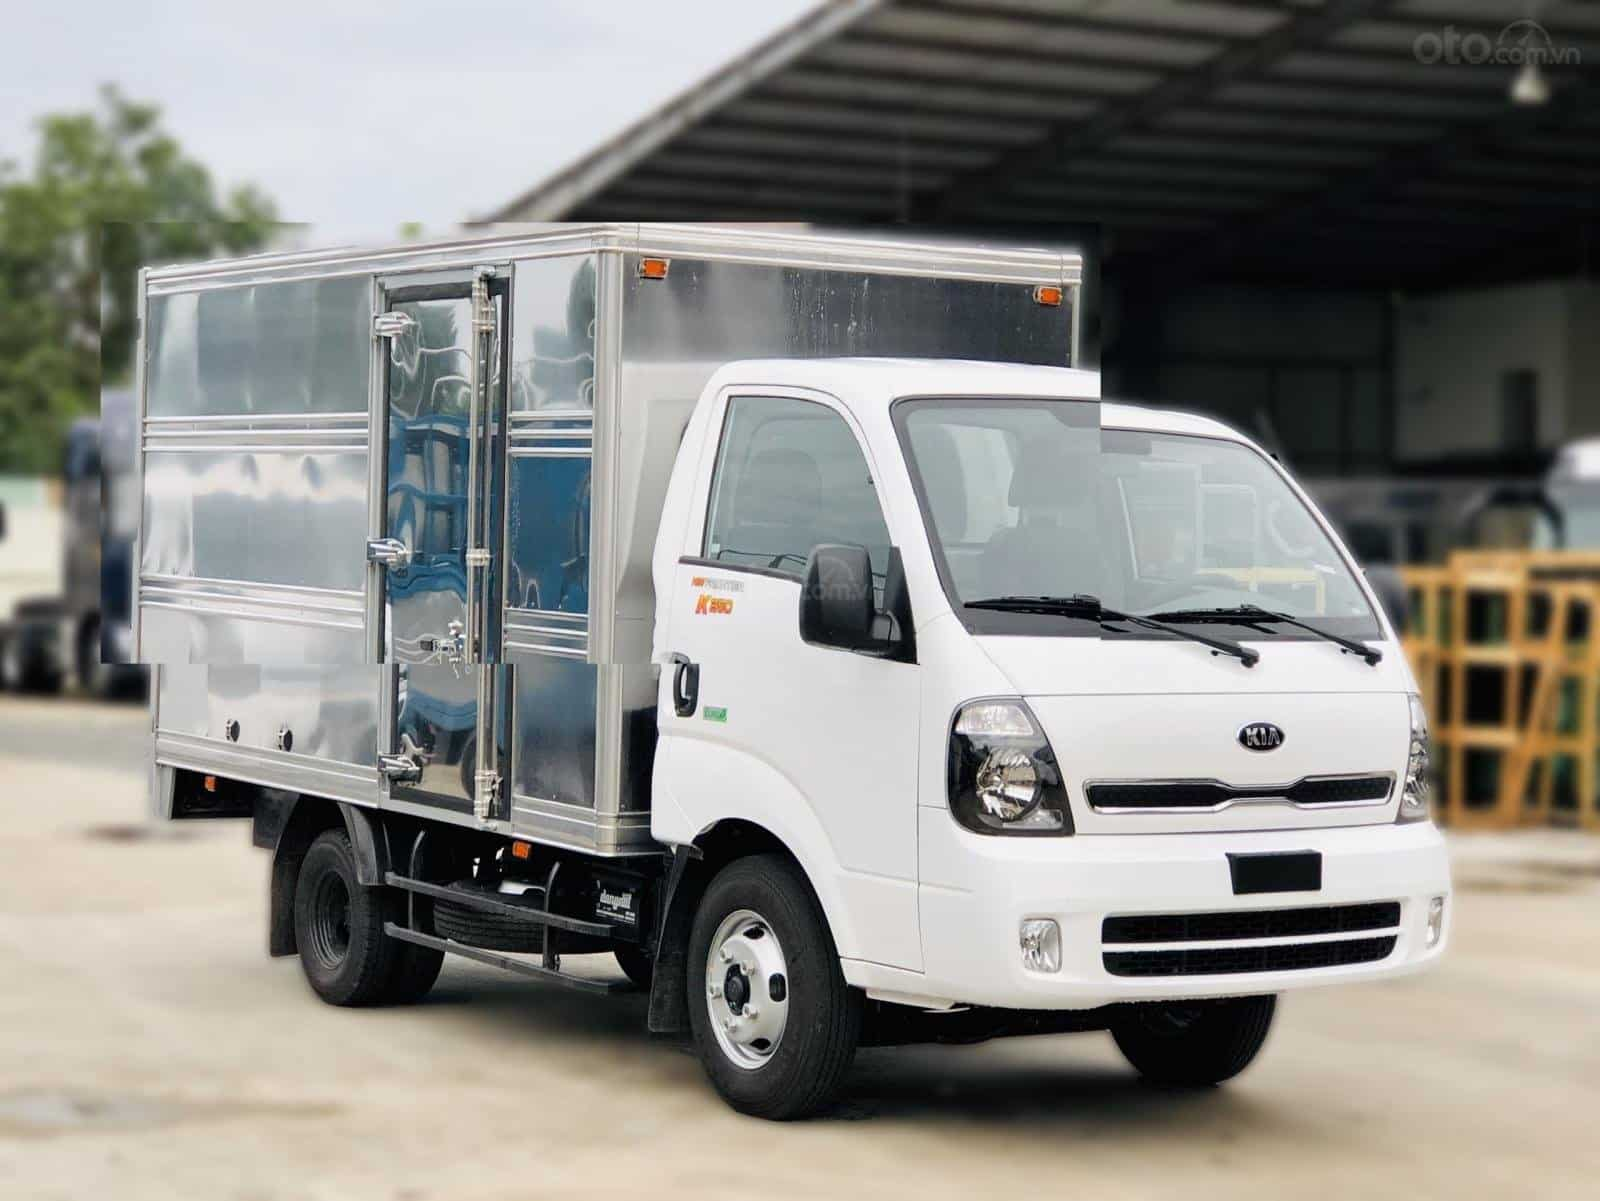 Mức giá xe tải KIA 1 tấn bao nhiêu hiện nay